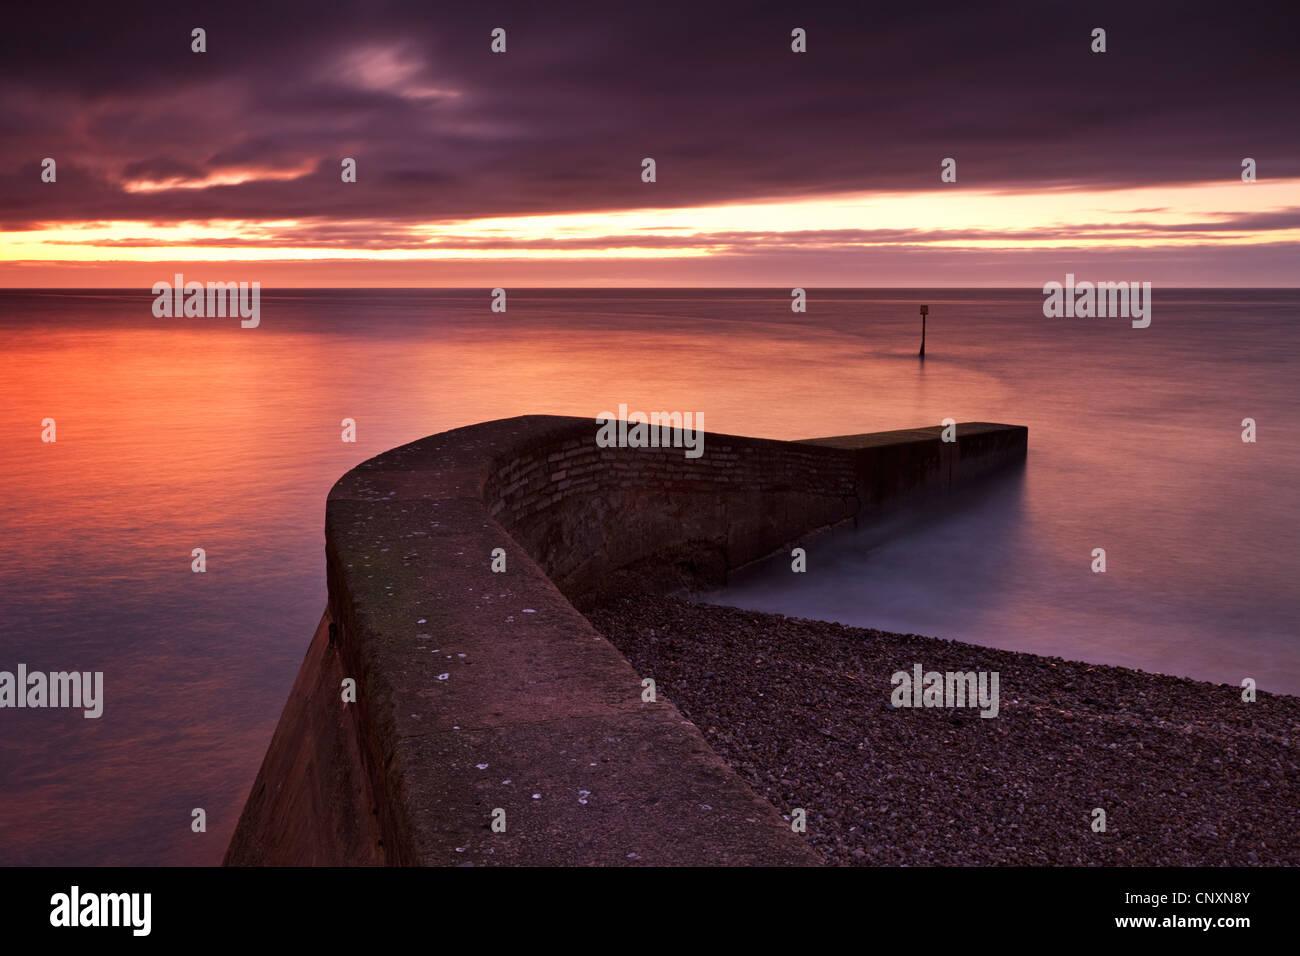 Stone jetty on Sidmouth beachfront at sunrise, Sidmouth, Devon, England. Winter (January) 2012. - Stock Image